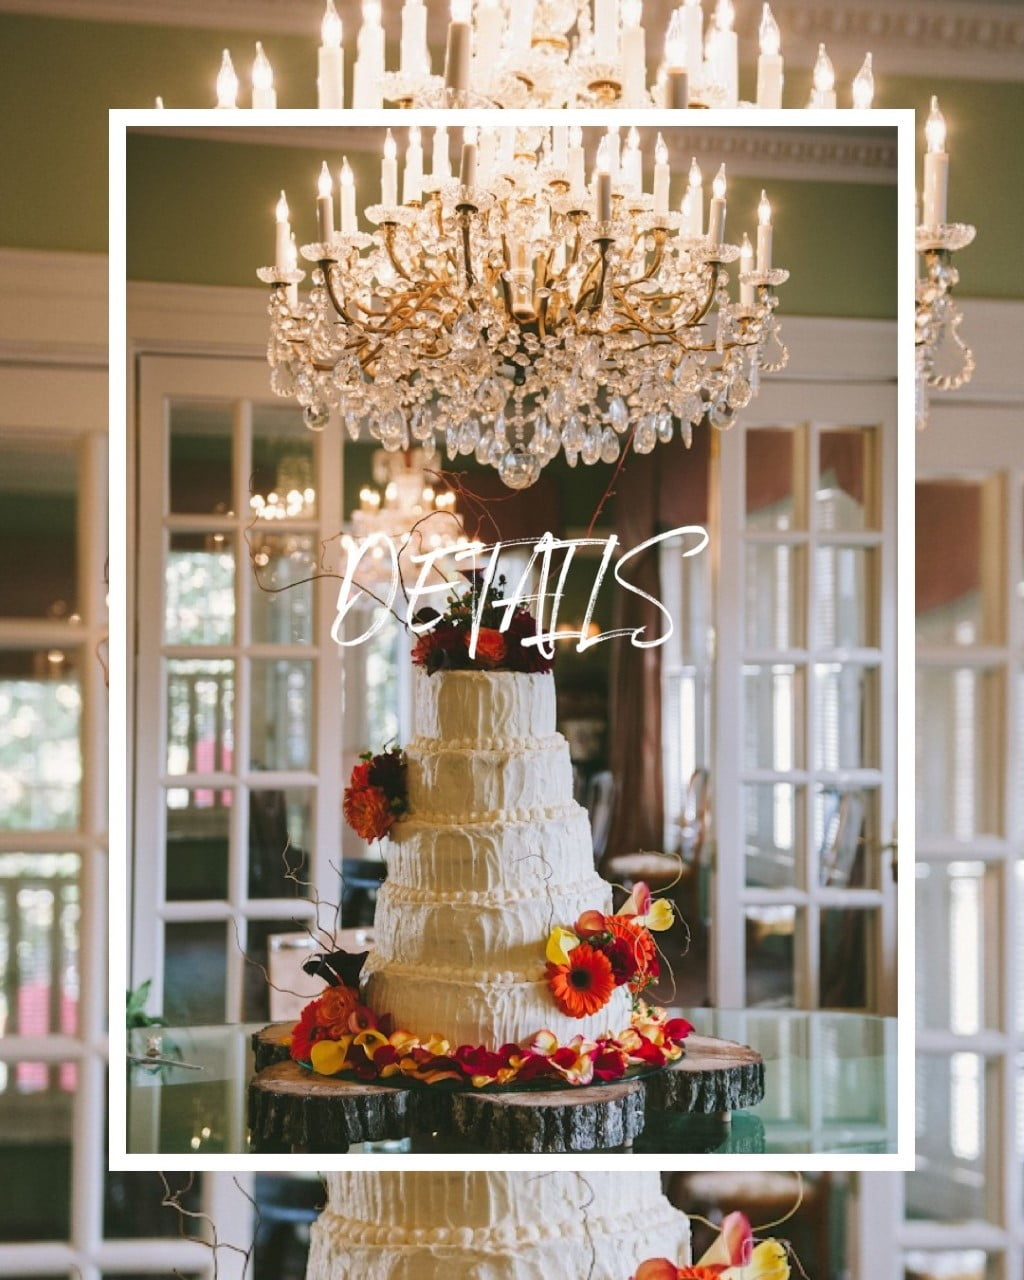 """Details"" over photo of wedding cake"